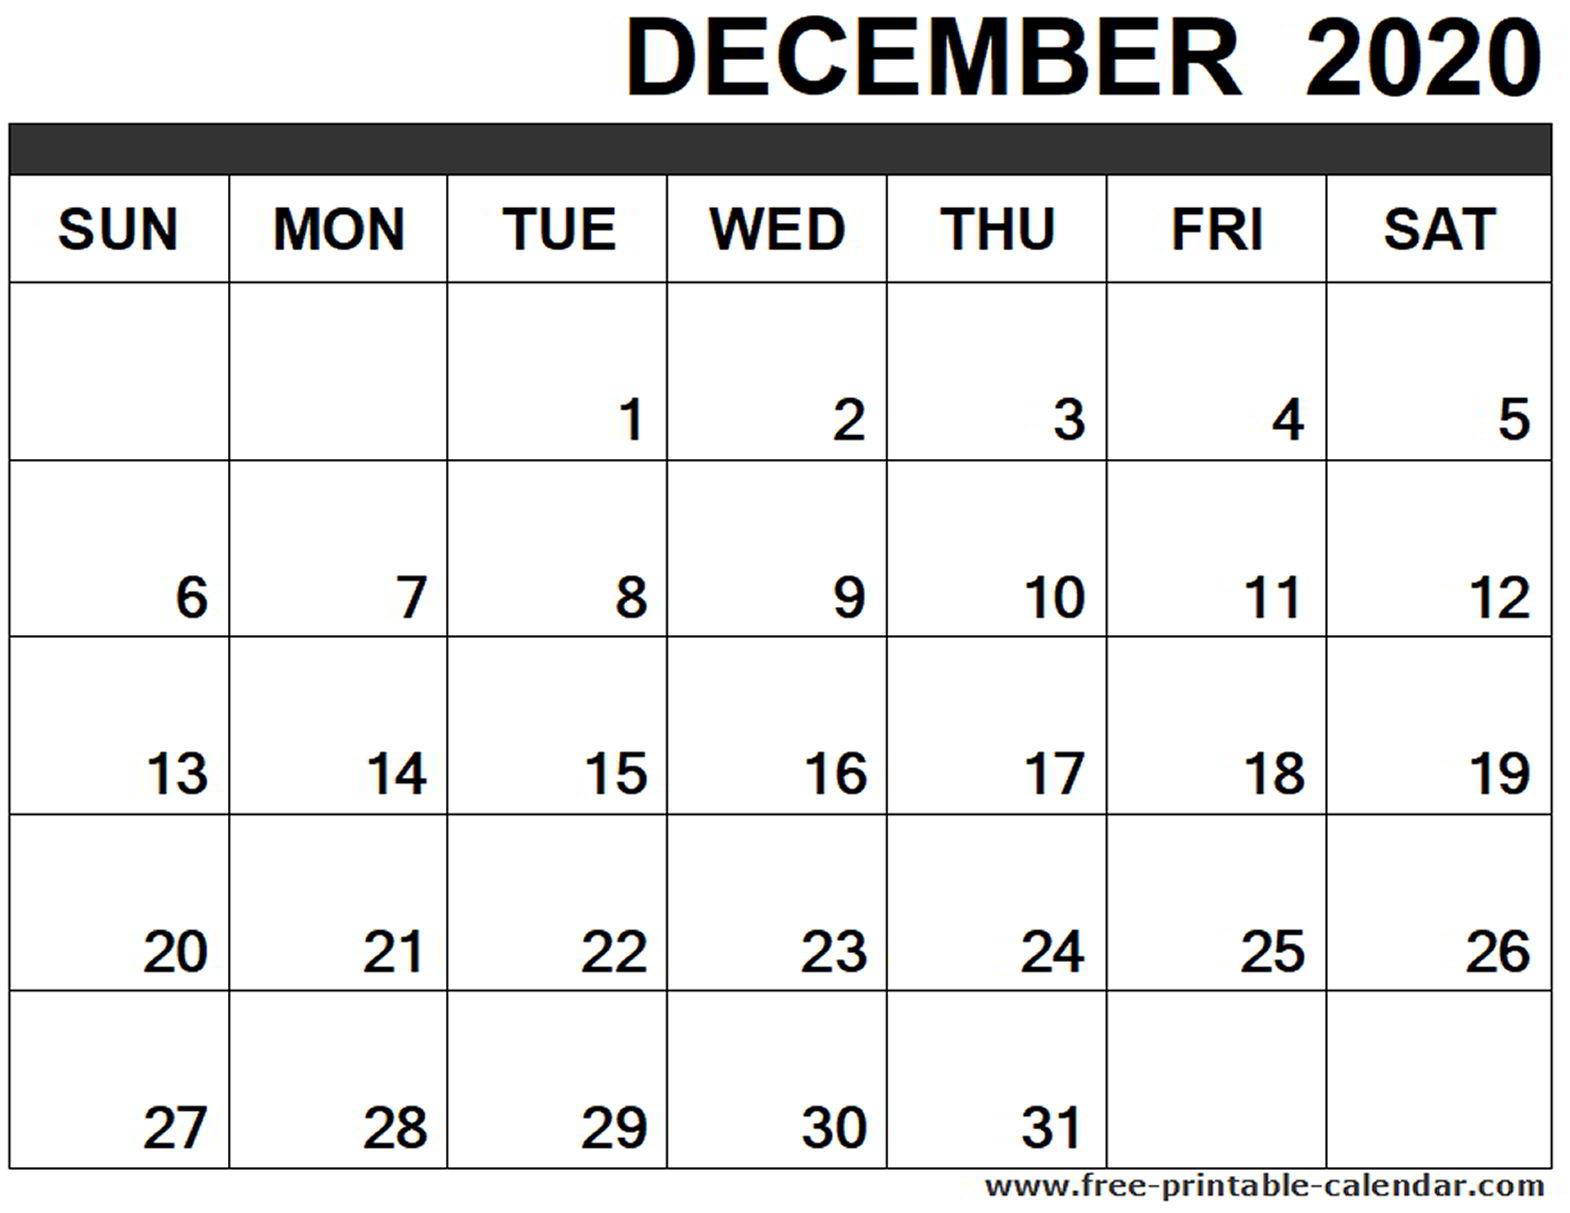 December 2020 Calendar Printable - Free-Printable-Calendar